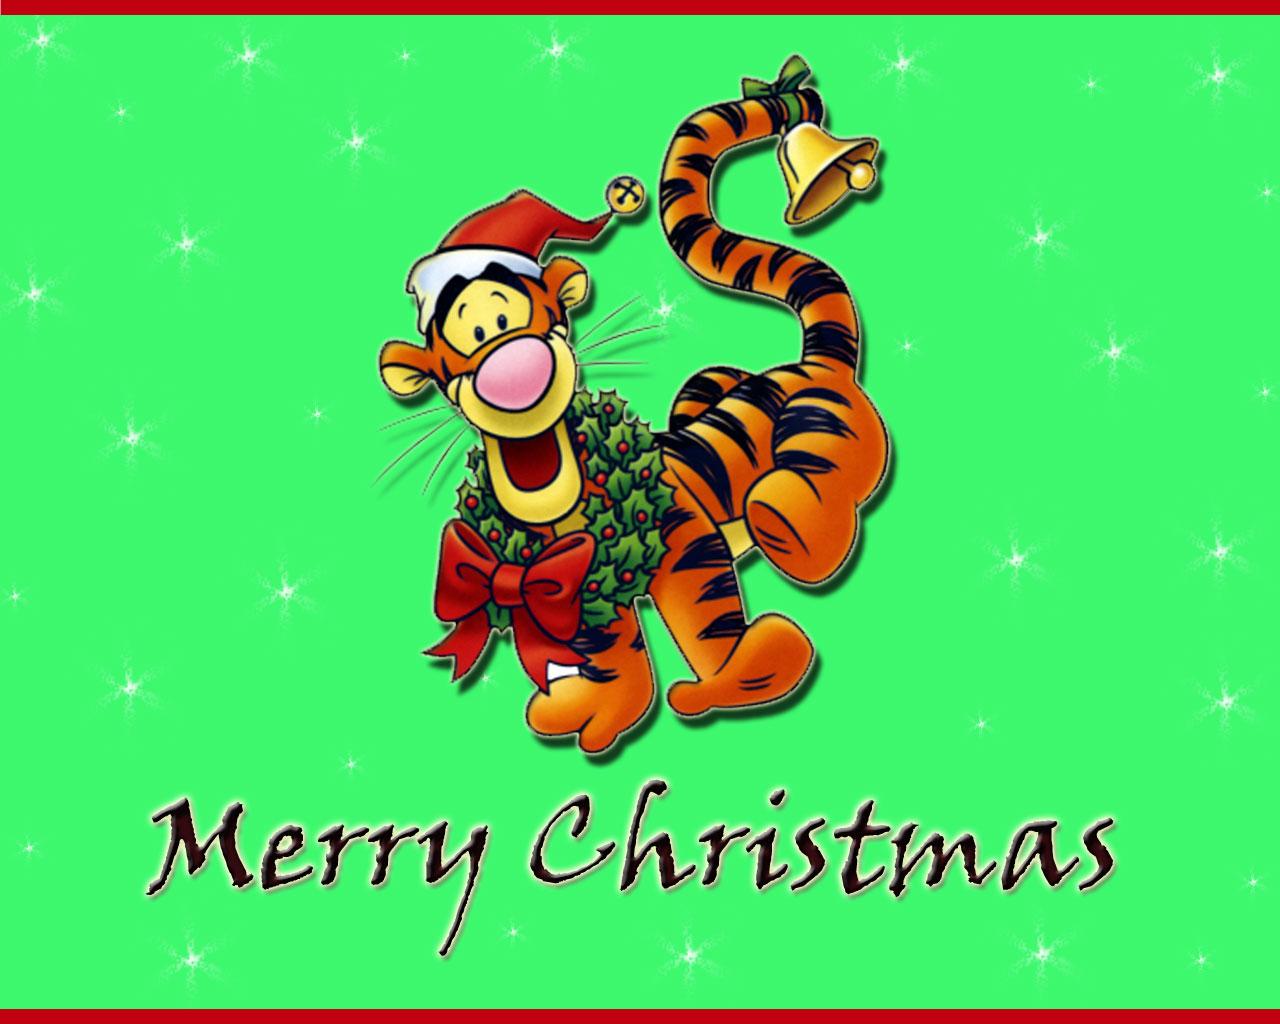 winnie the pooh christmas wallpapers christmas cartoons